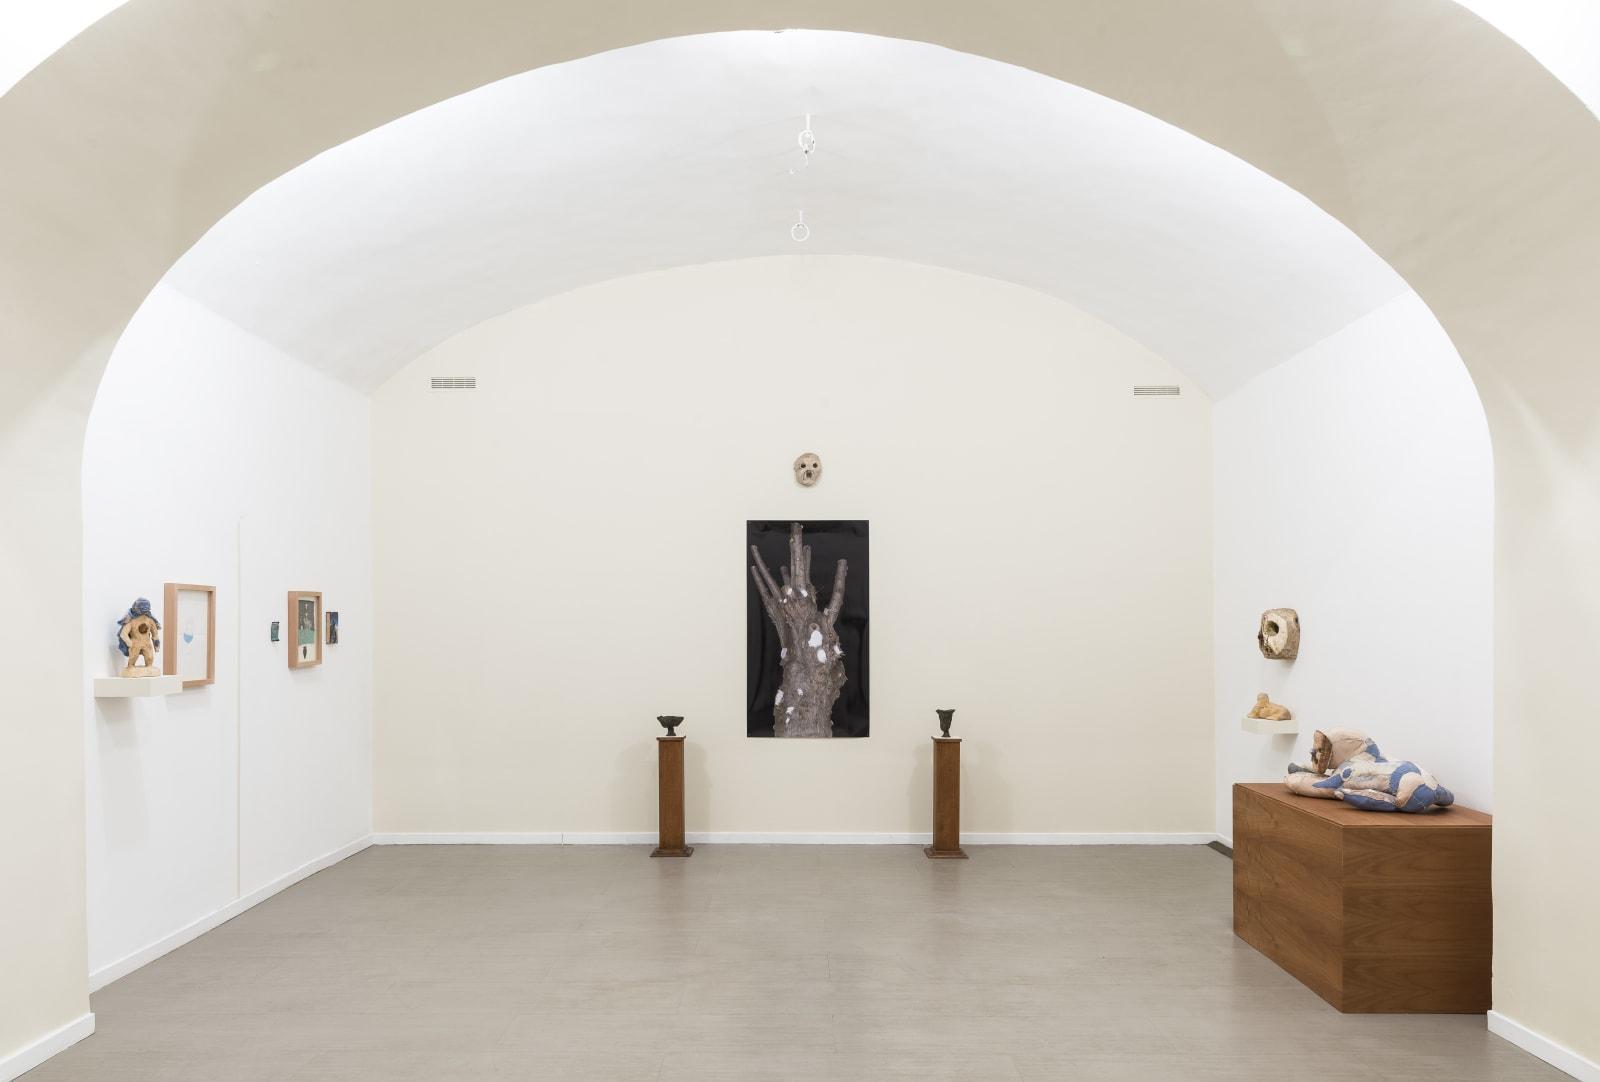 Evgeny Antufiev, Fusion and Absorption, installation view at z2o Sara Zanin Gallery